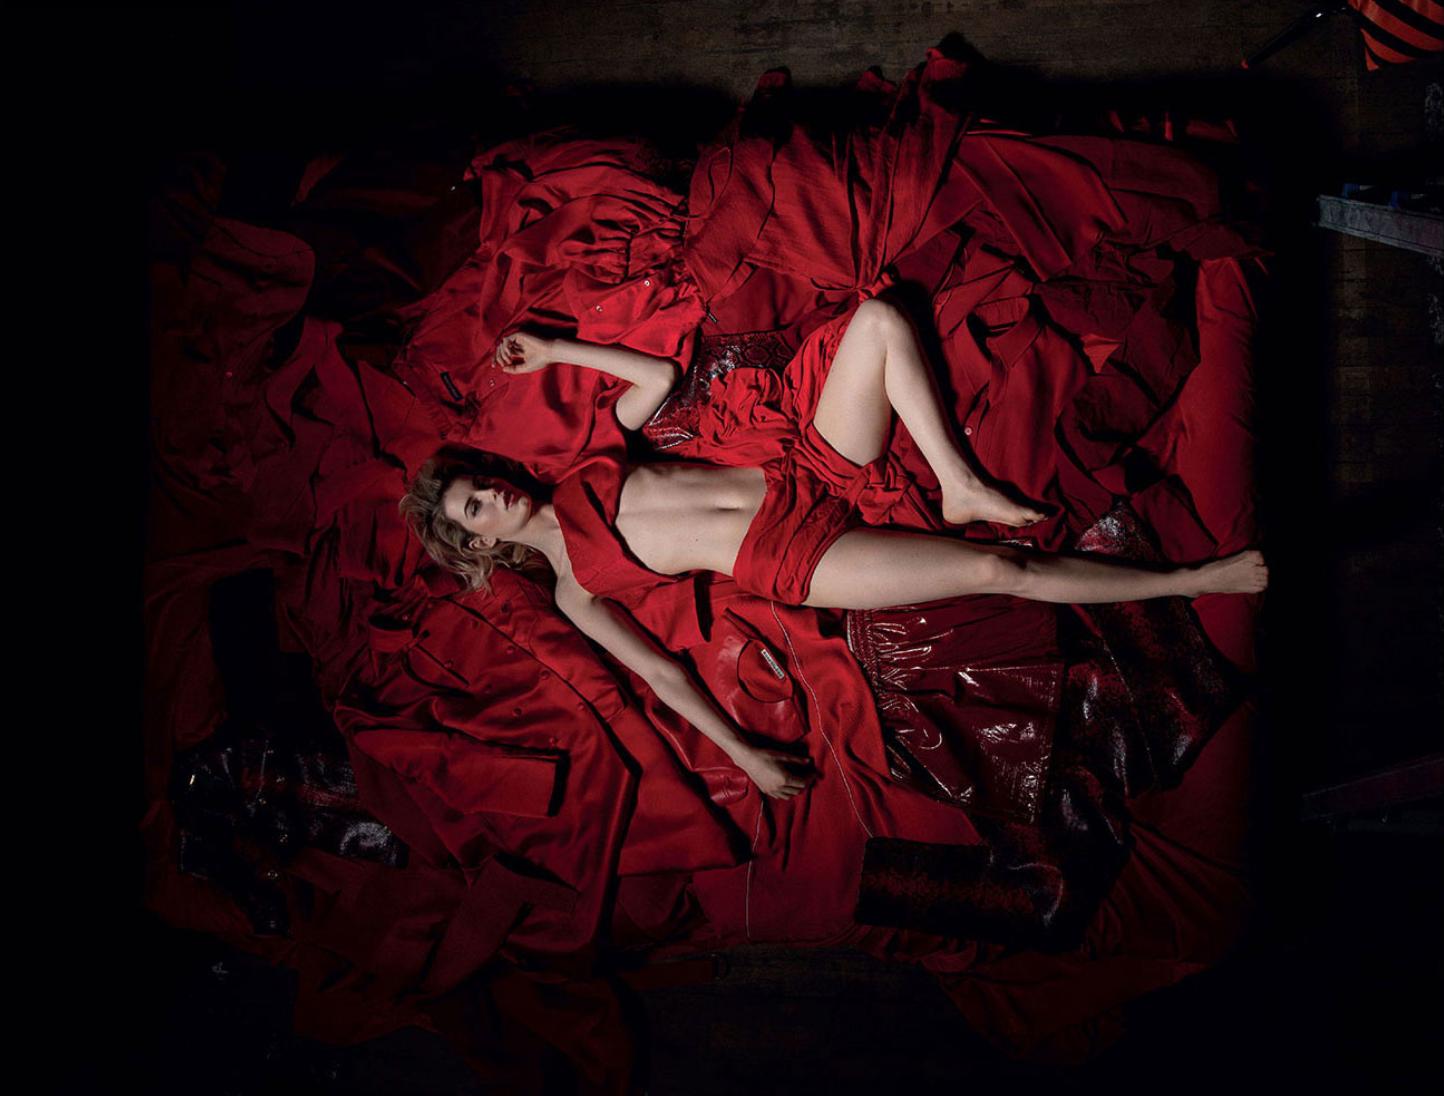 Photographer Filip Koludrovic